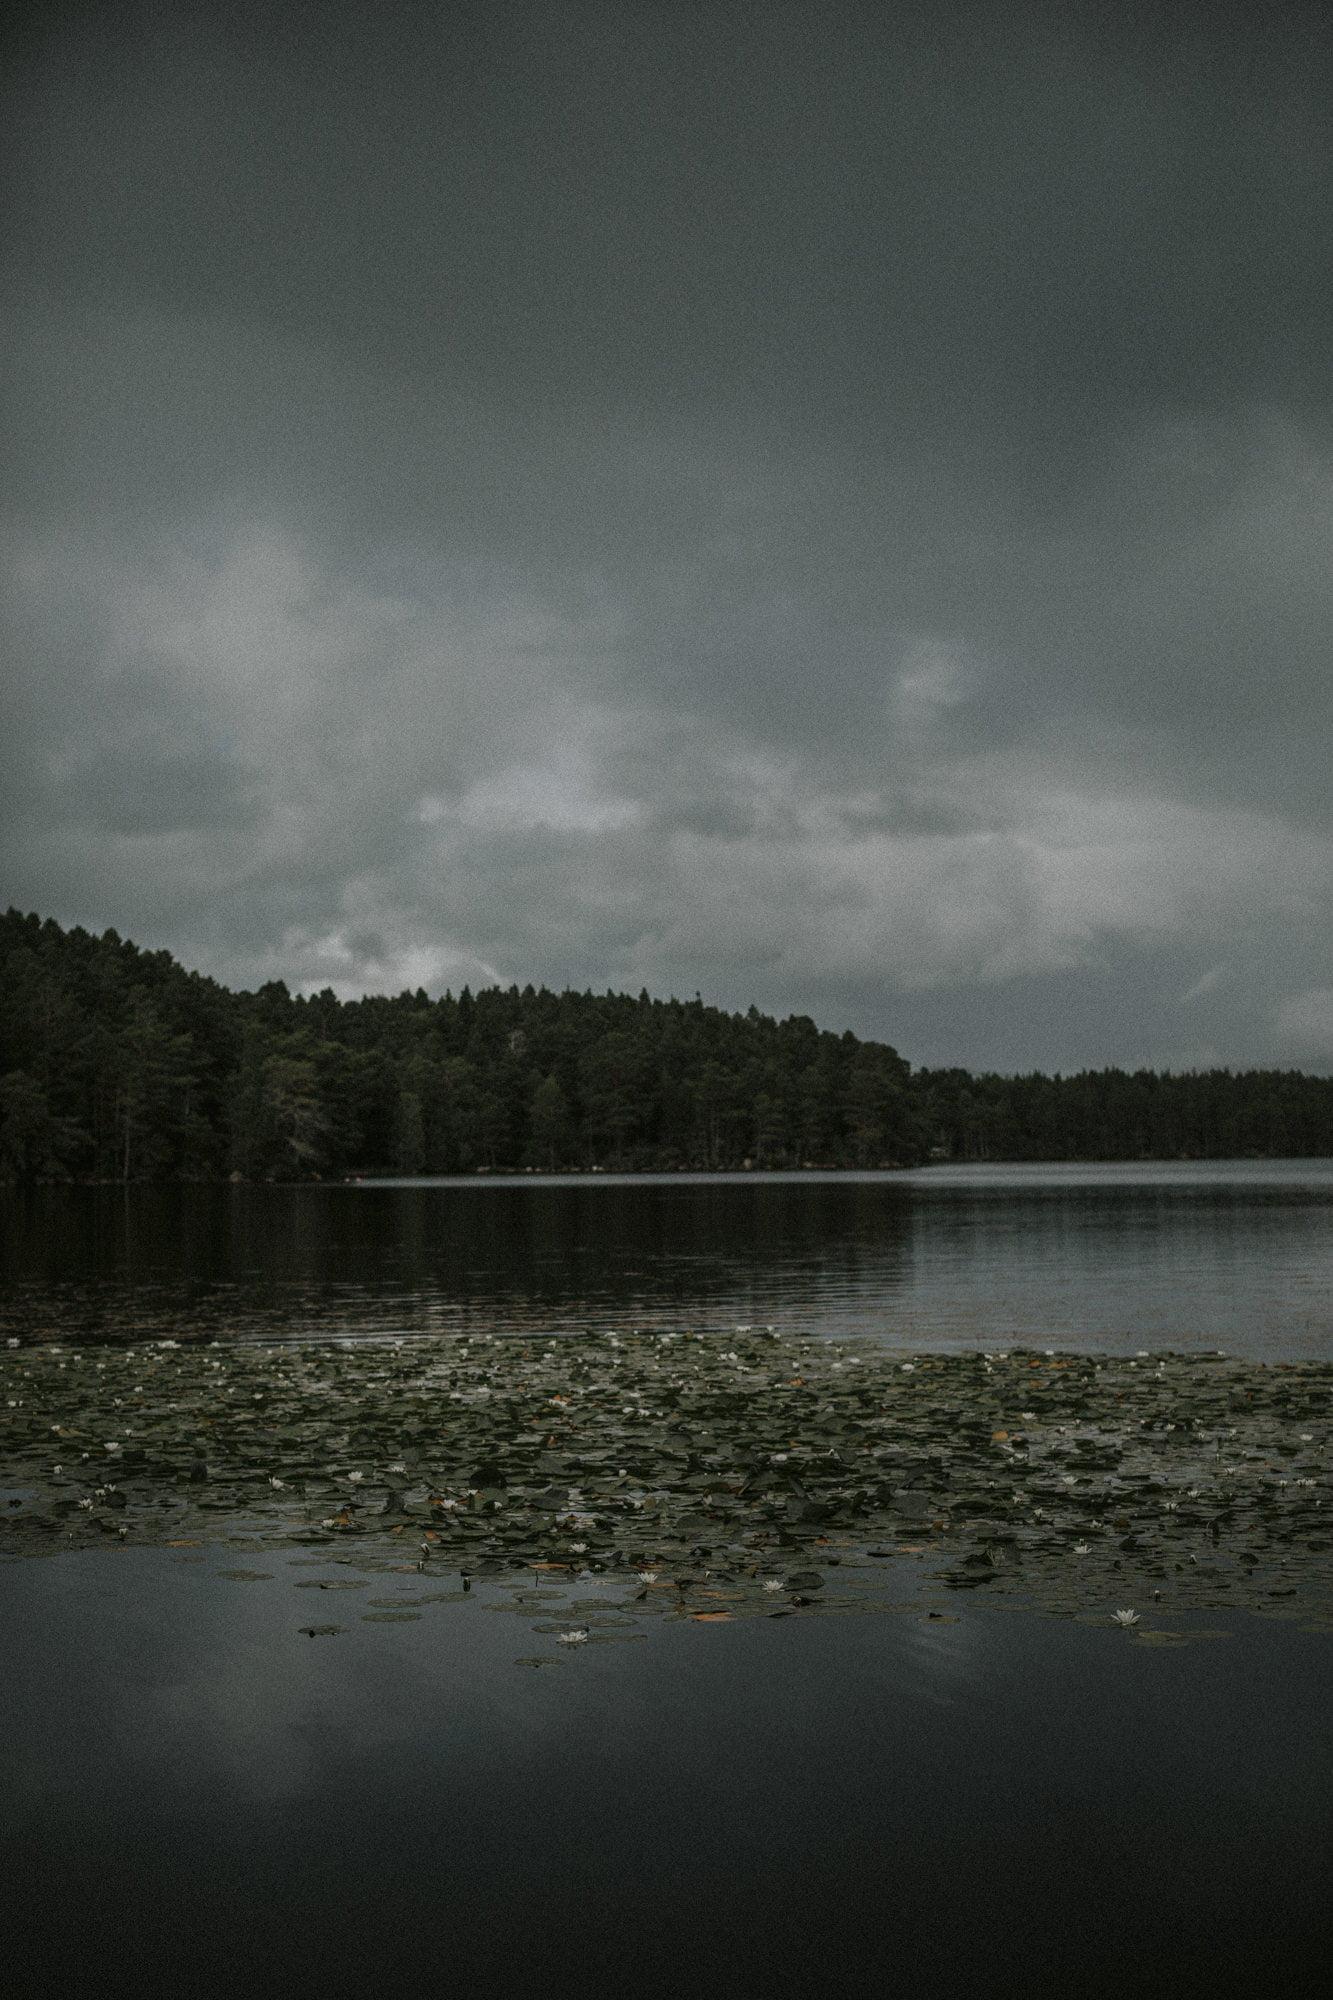 Loch Garten elopement, Aviemore elopement, Cairngorms elopement in the Scottish Highlands Lochs